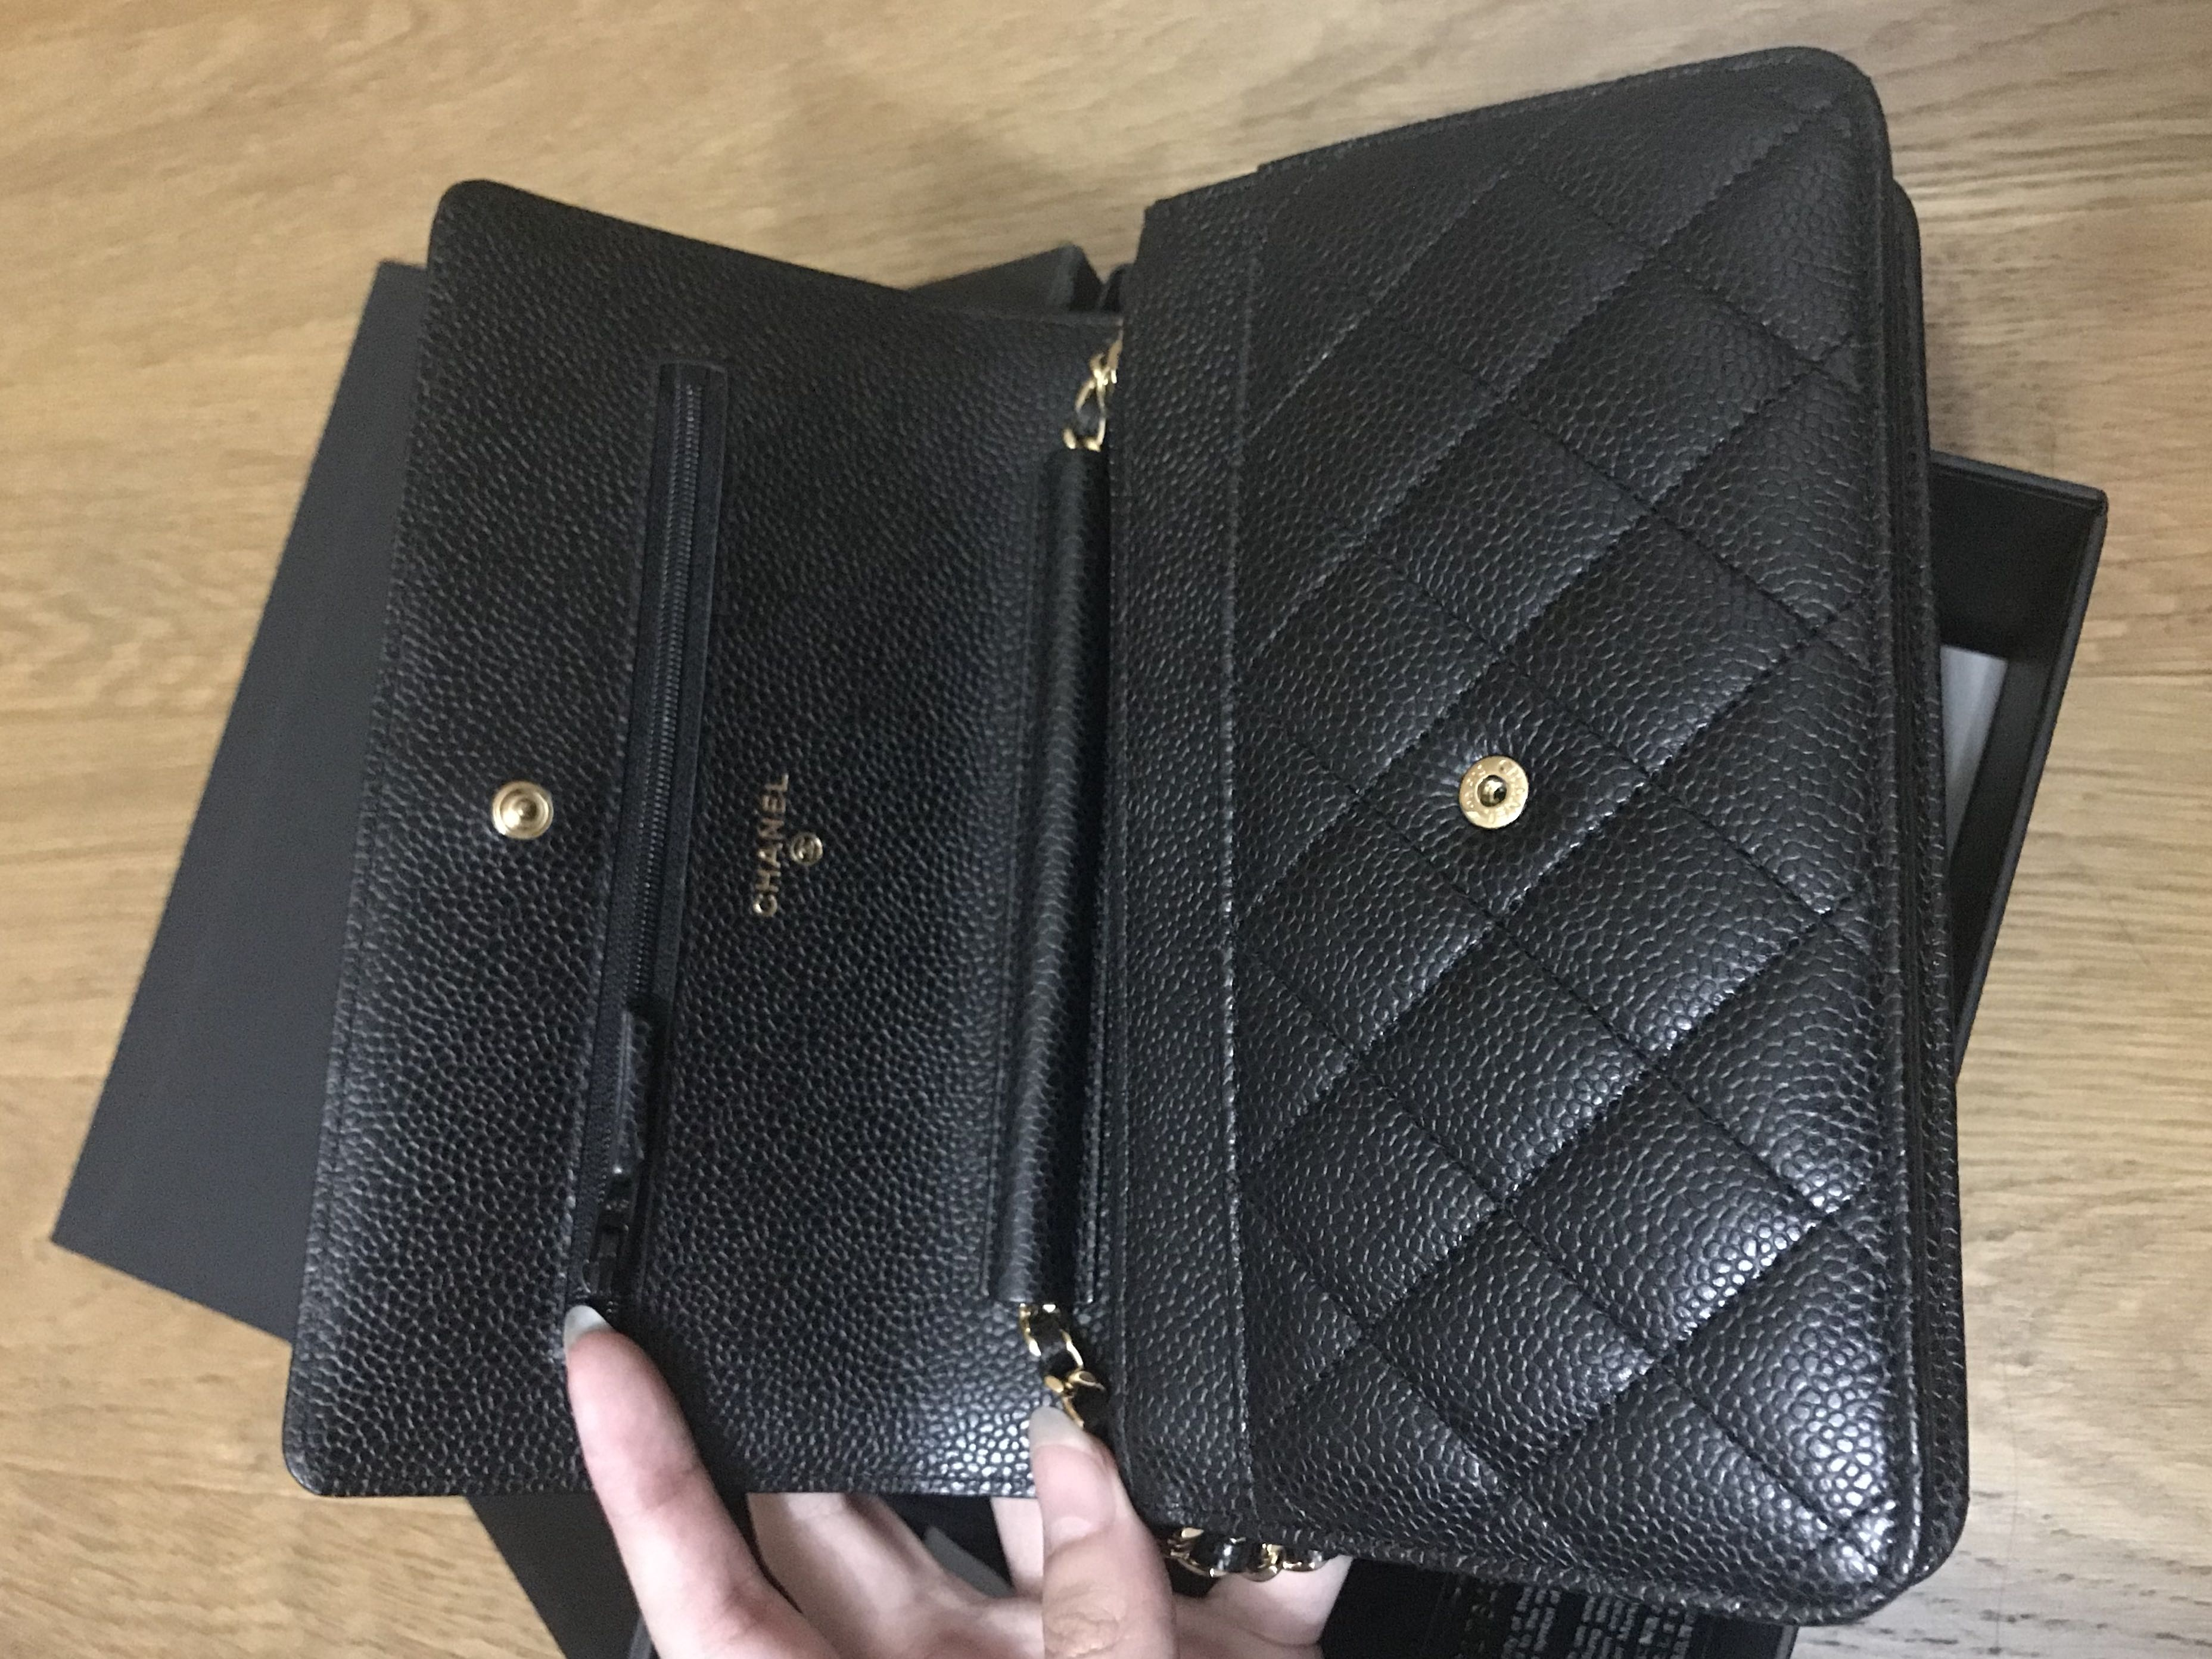 276a88c58248cf 💖Brand New💖Chanel Classic Woc Black Caviar Ghw #25, Luxury, Bags &  Wallets, Handbags on Carousell